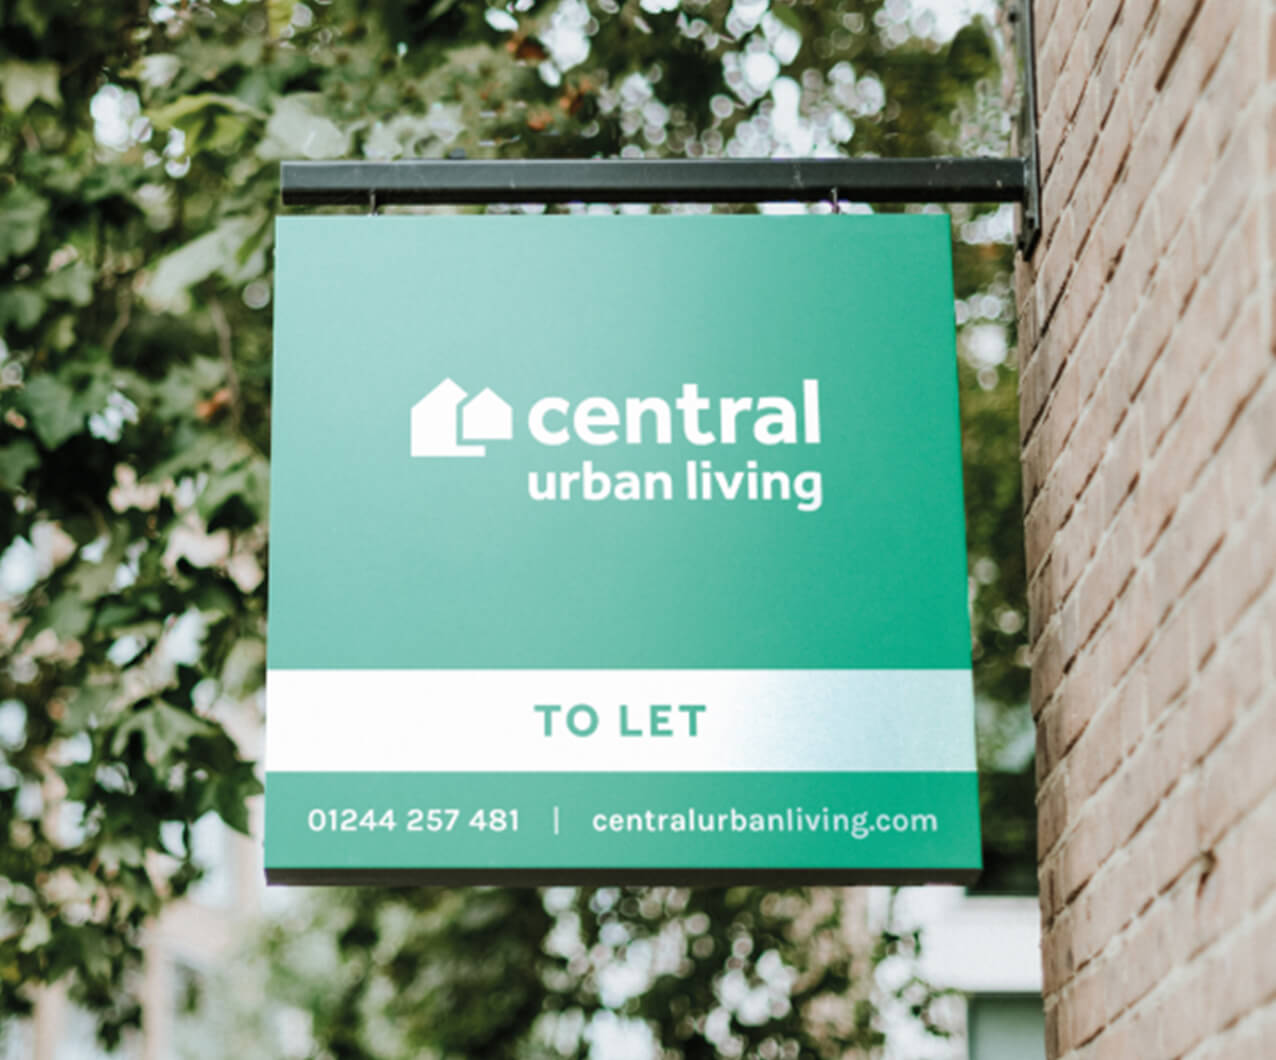 Central Urban Living branded to let property signage